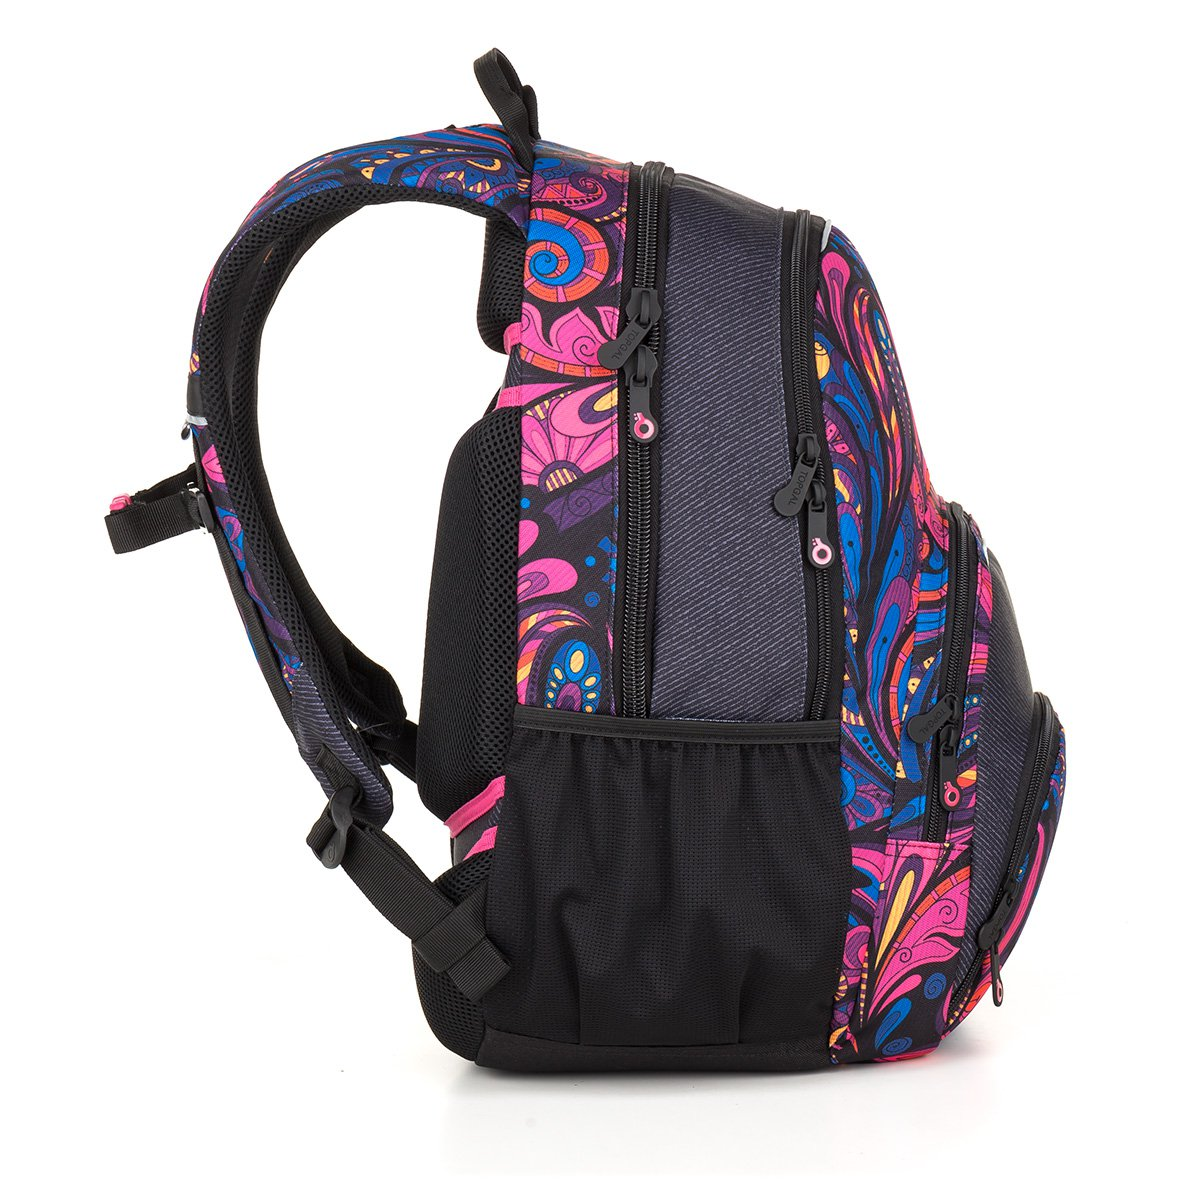 Topgal Studentský batoh SIAN 18031 G SET SMALL + penál 18031 G + ... 309606c553